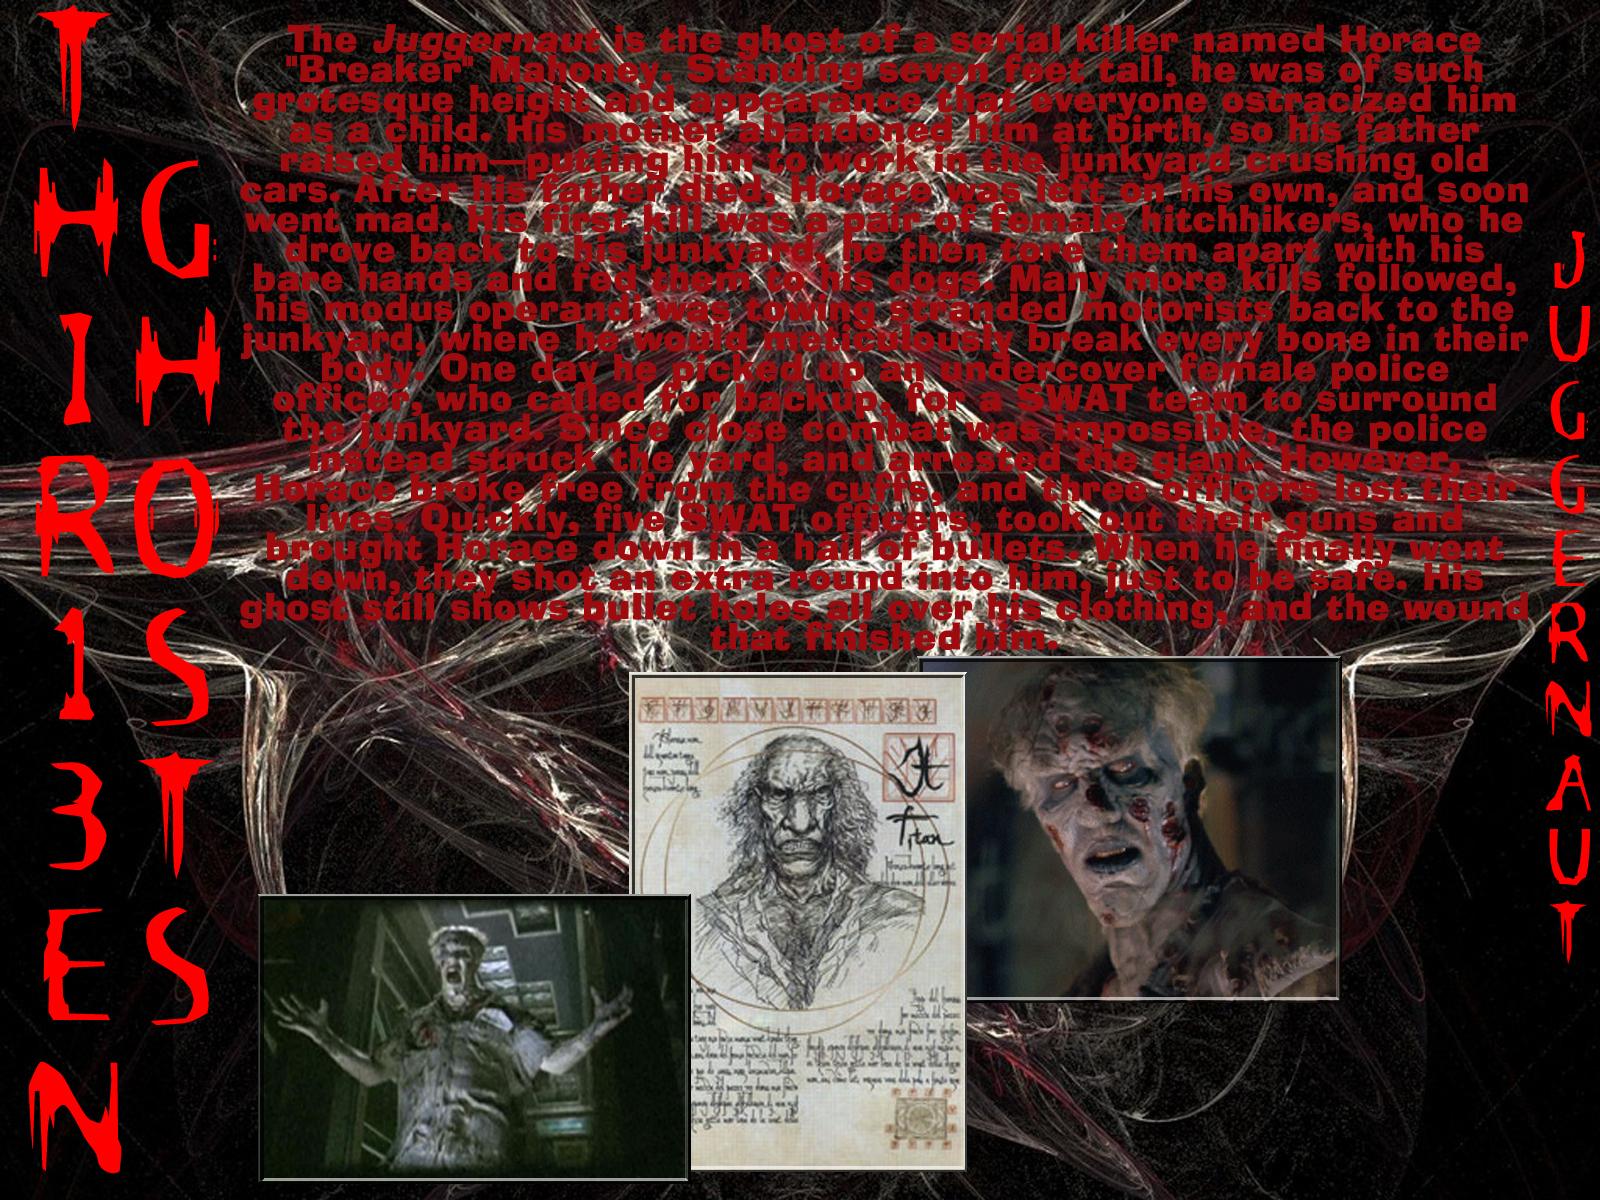 13 ghosts the juggernaut